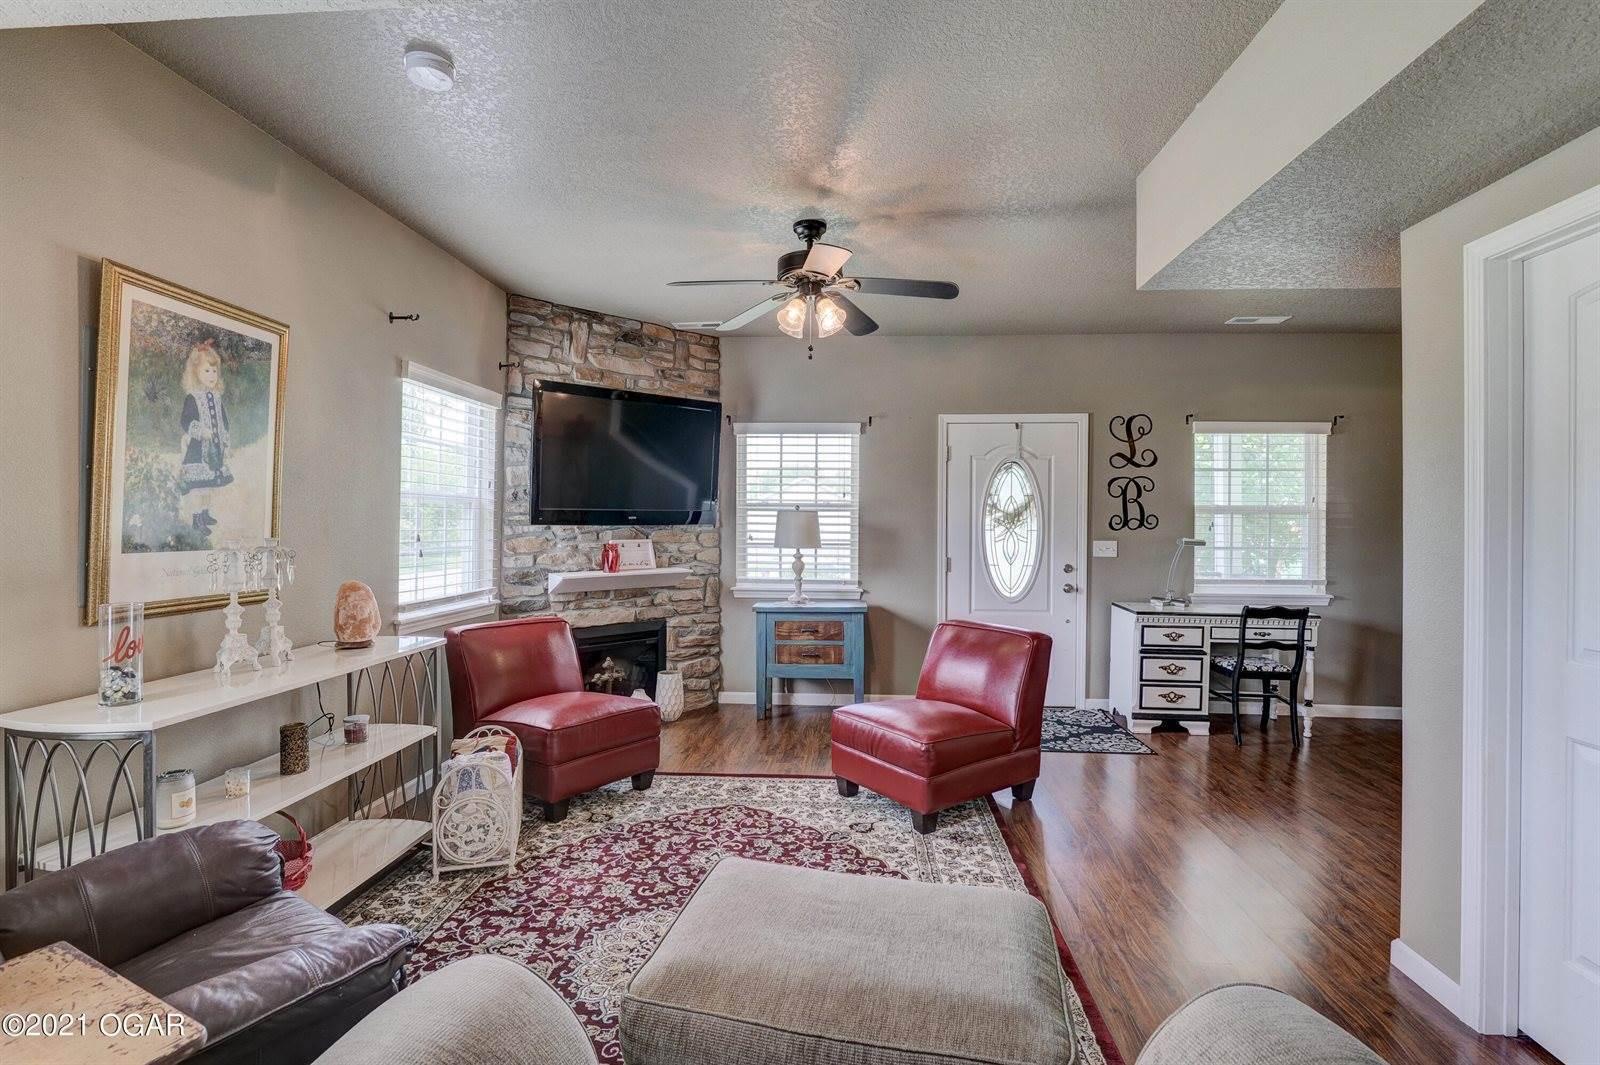 201 North Mina Avenue, Joplin, MO 64801